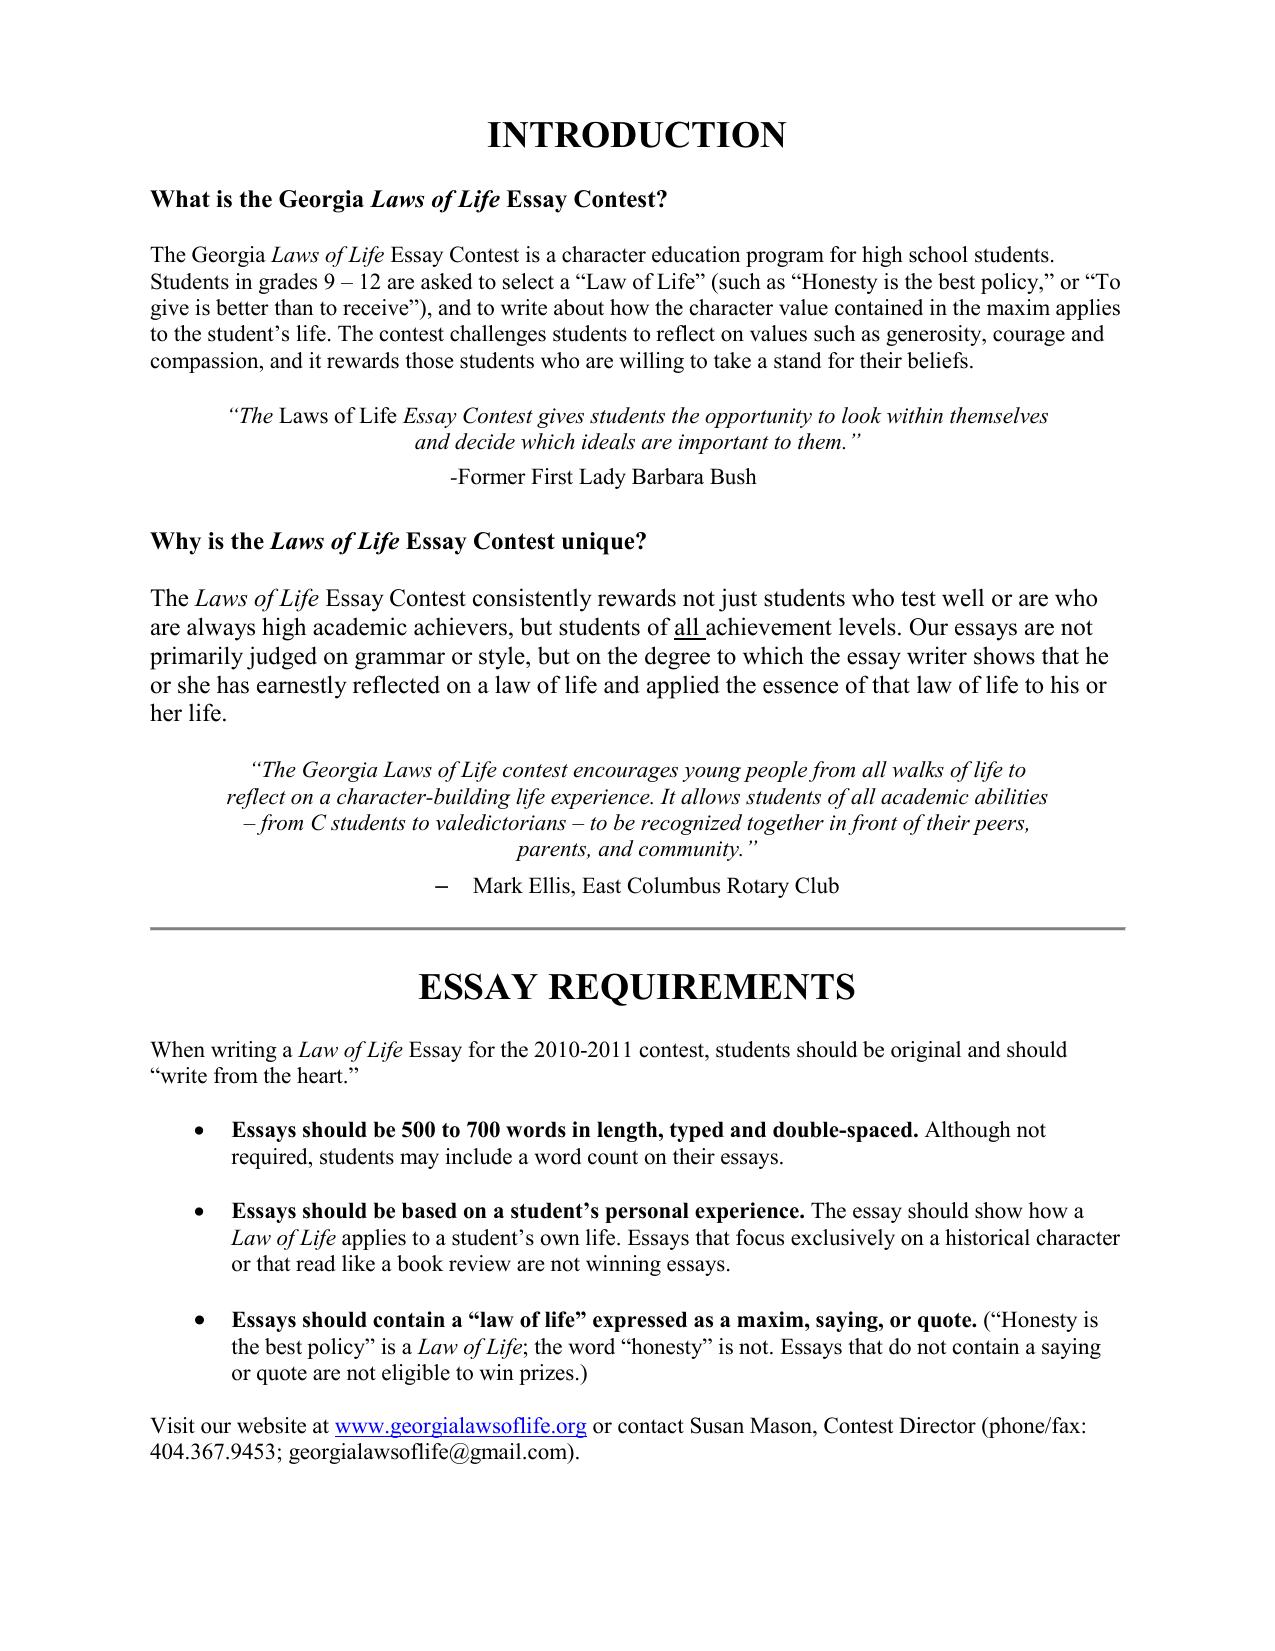 Pediatric anesthesia fellowship personal statement